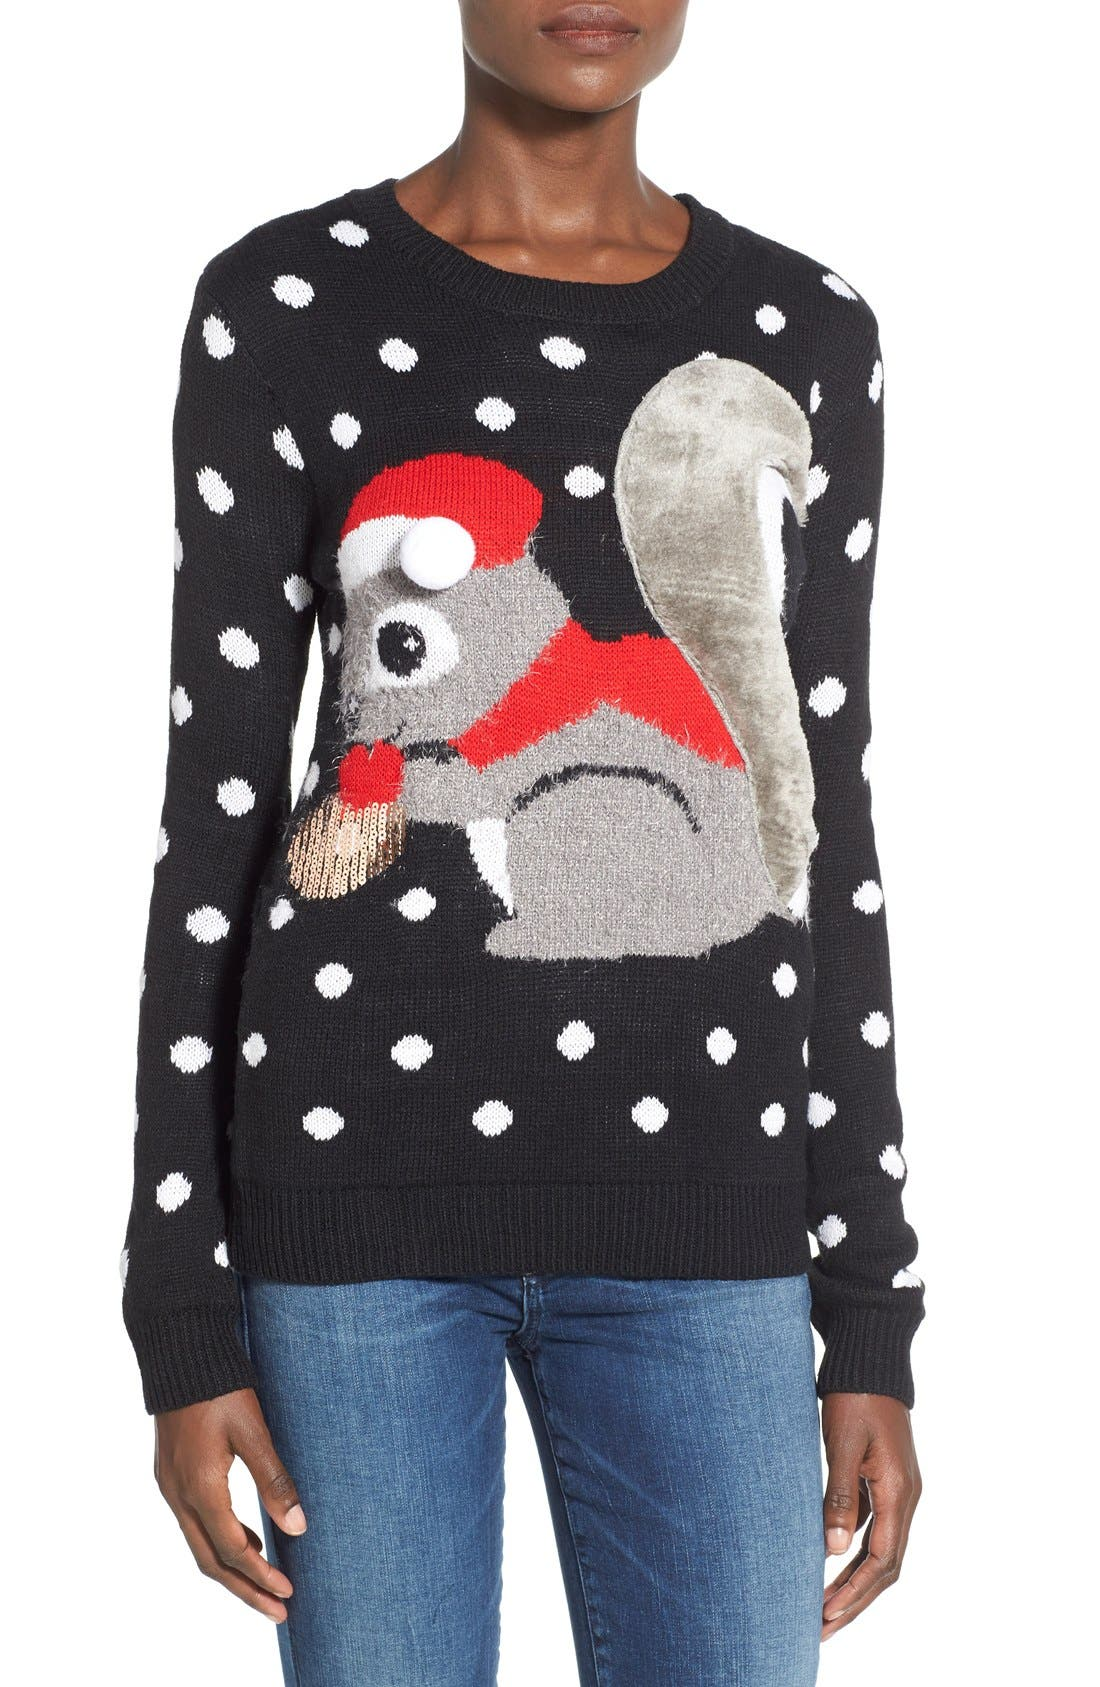 Alternate Image 1 Selected - Ten Sixty Sherman Squirrel Christmas Sweater